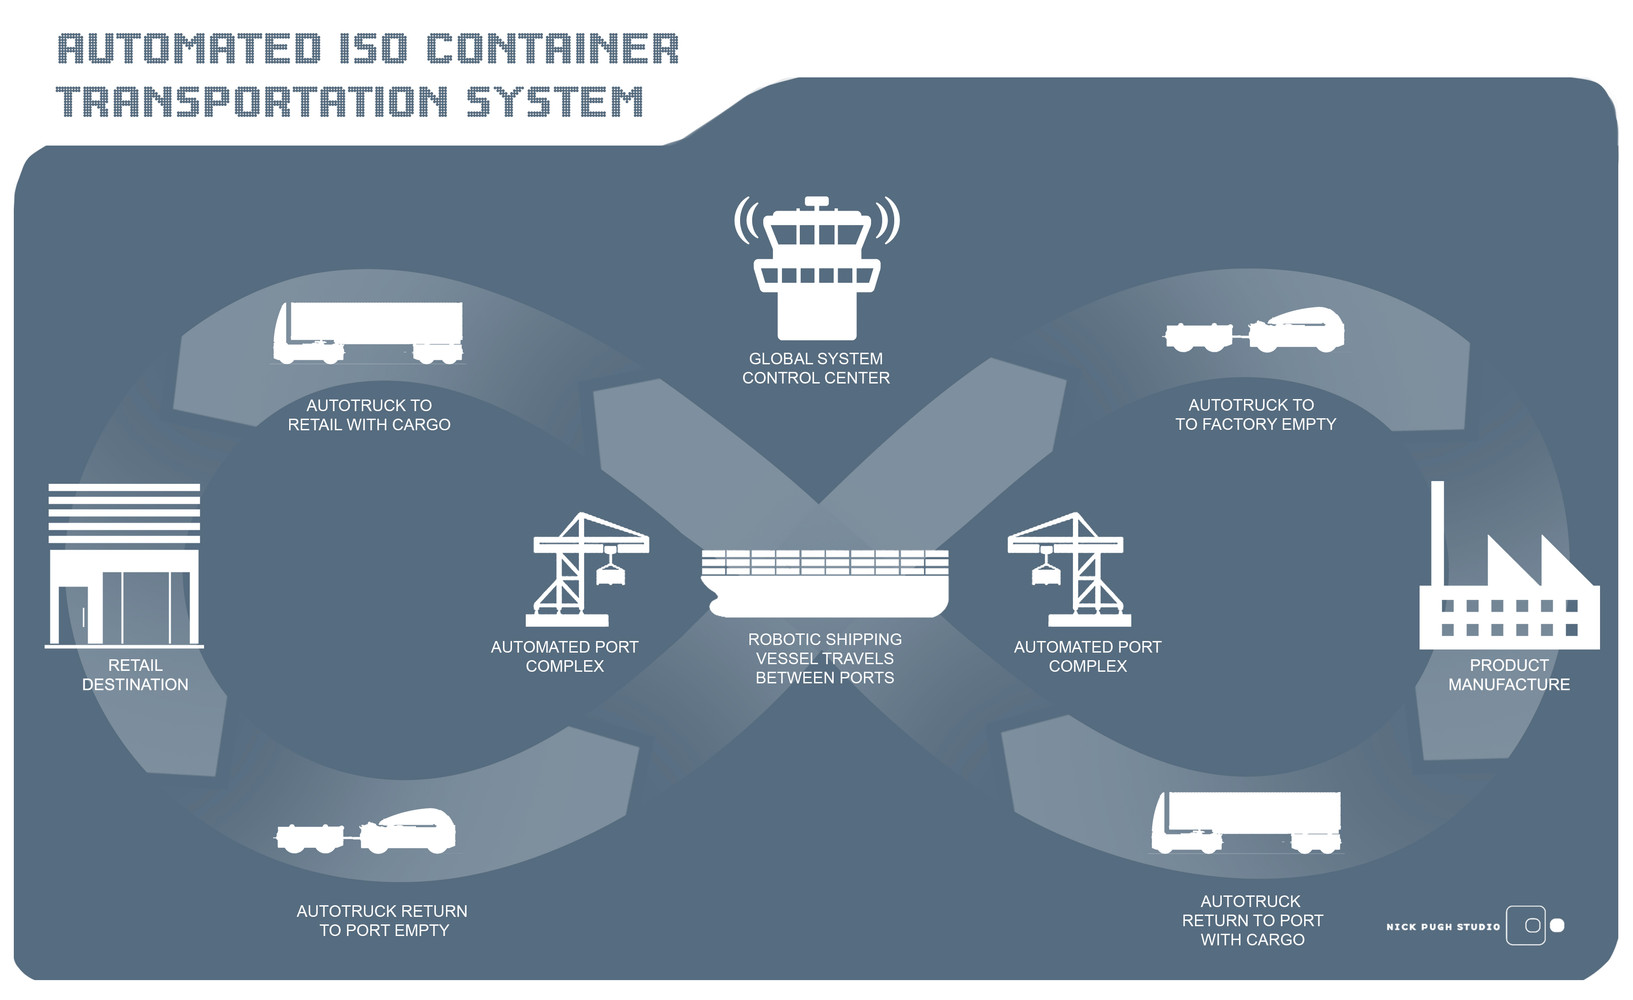 automatedContainerTransportSystem.jpg